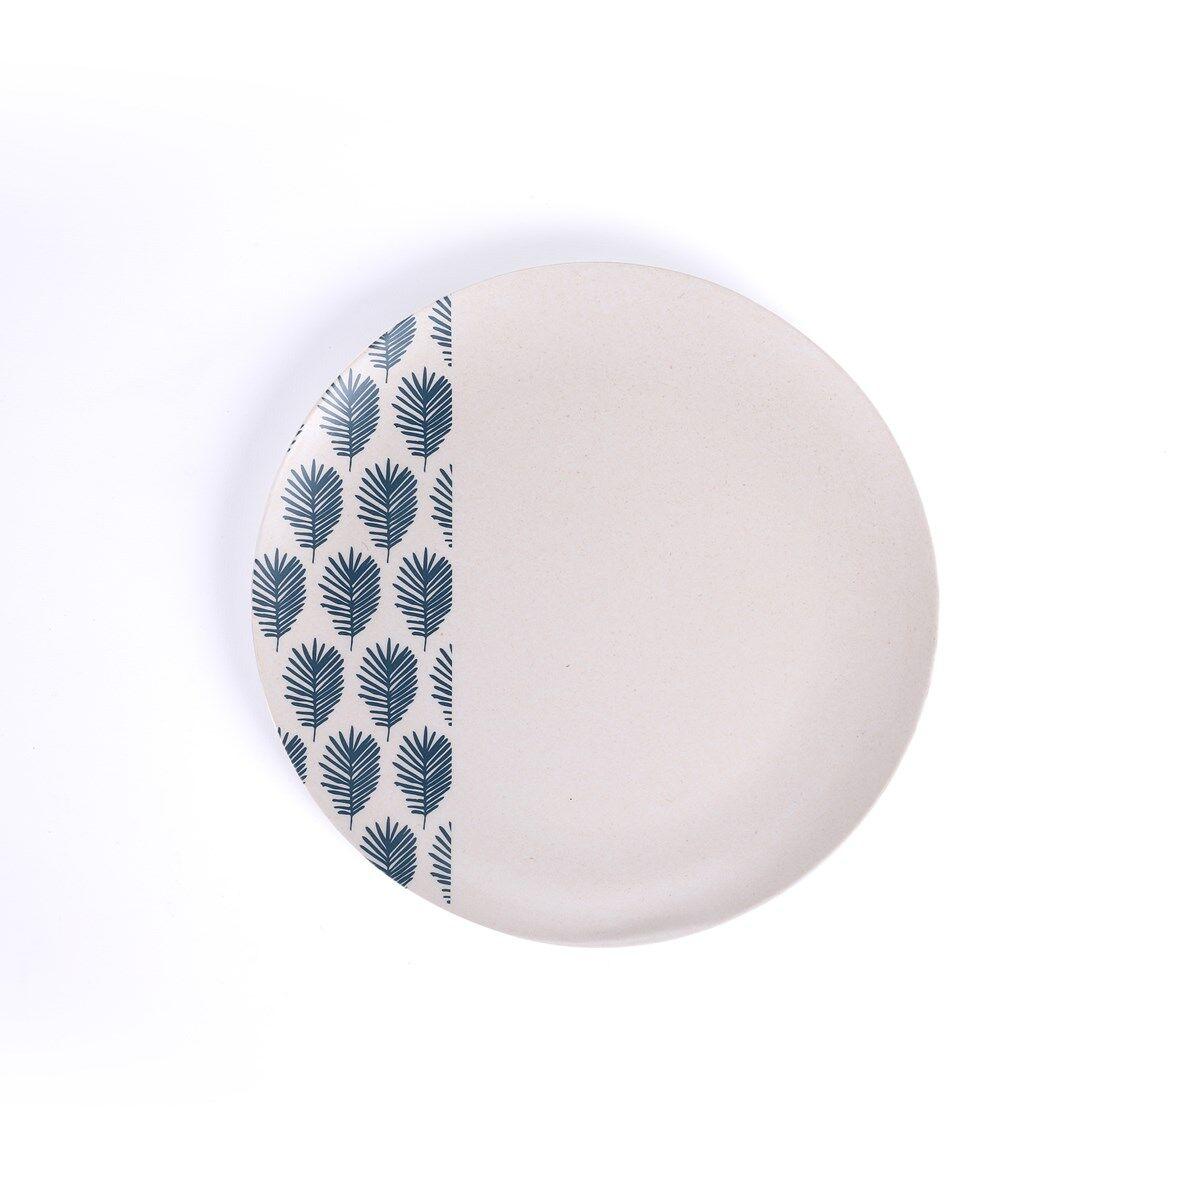 Livoo Grande assiette en fibre de bambou blanc - Lot de 4